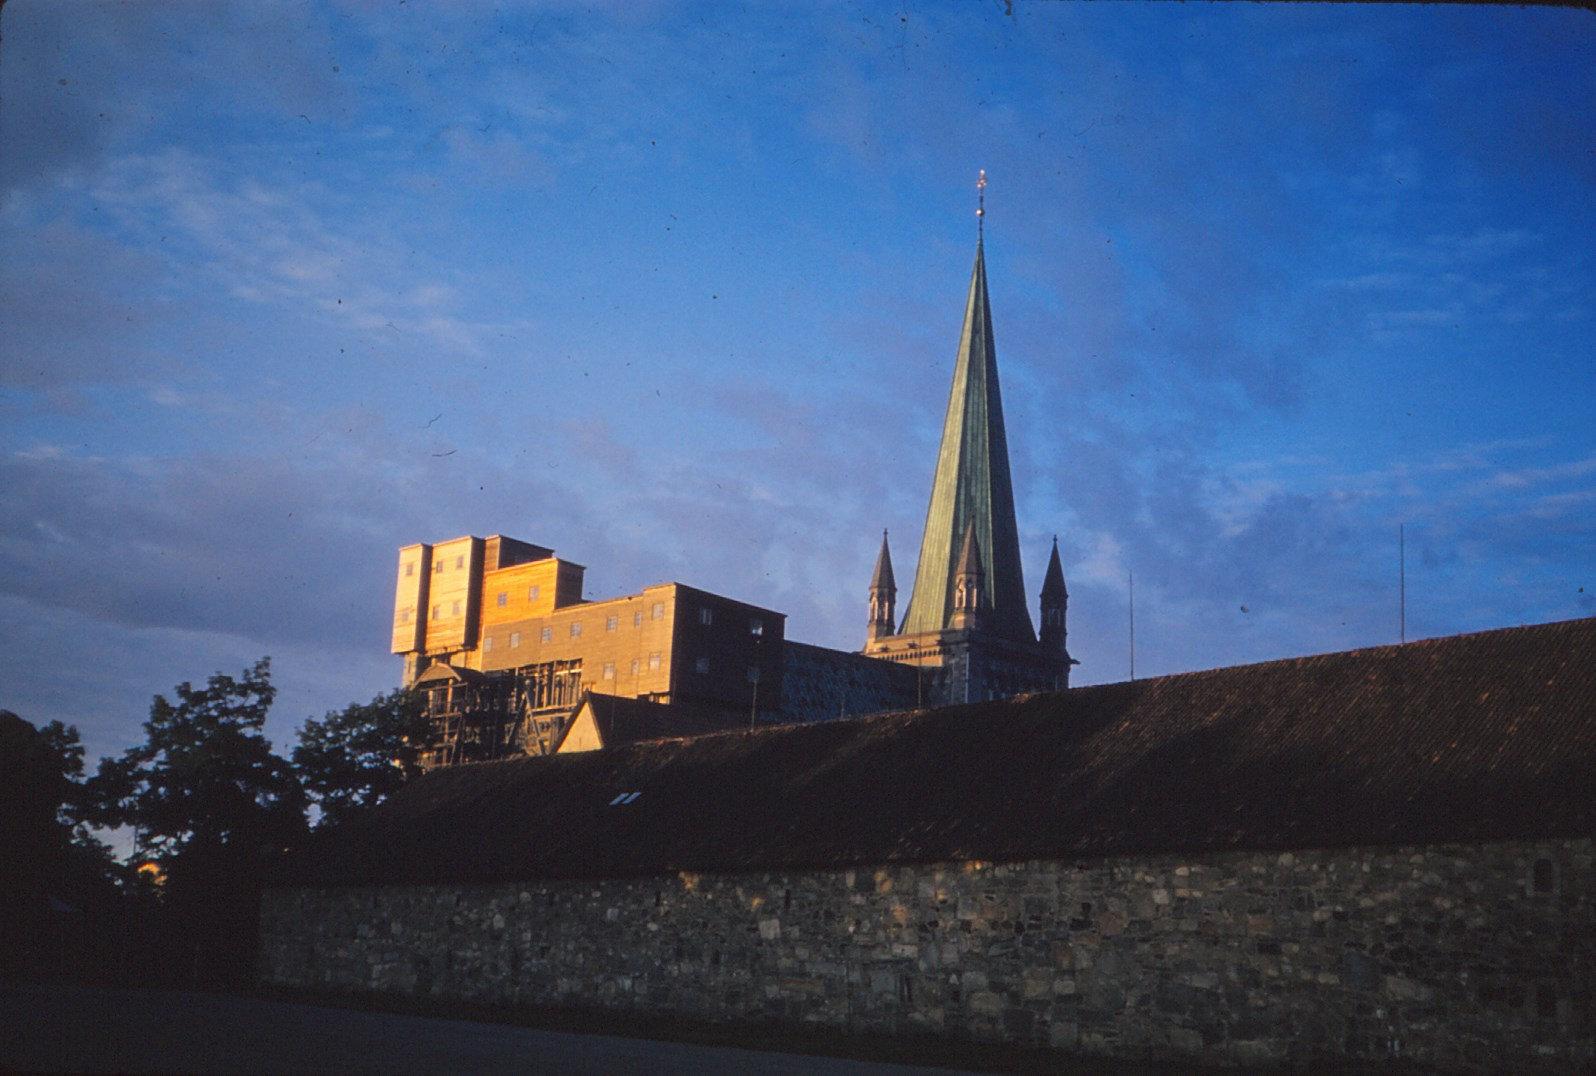 1156 (6) Kathedraal van Trondheim in avondzon